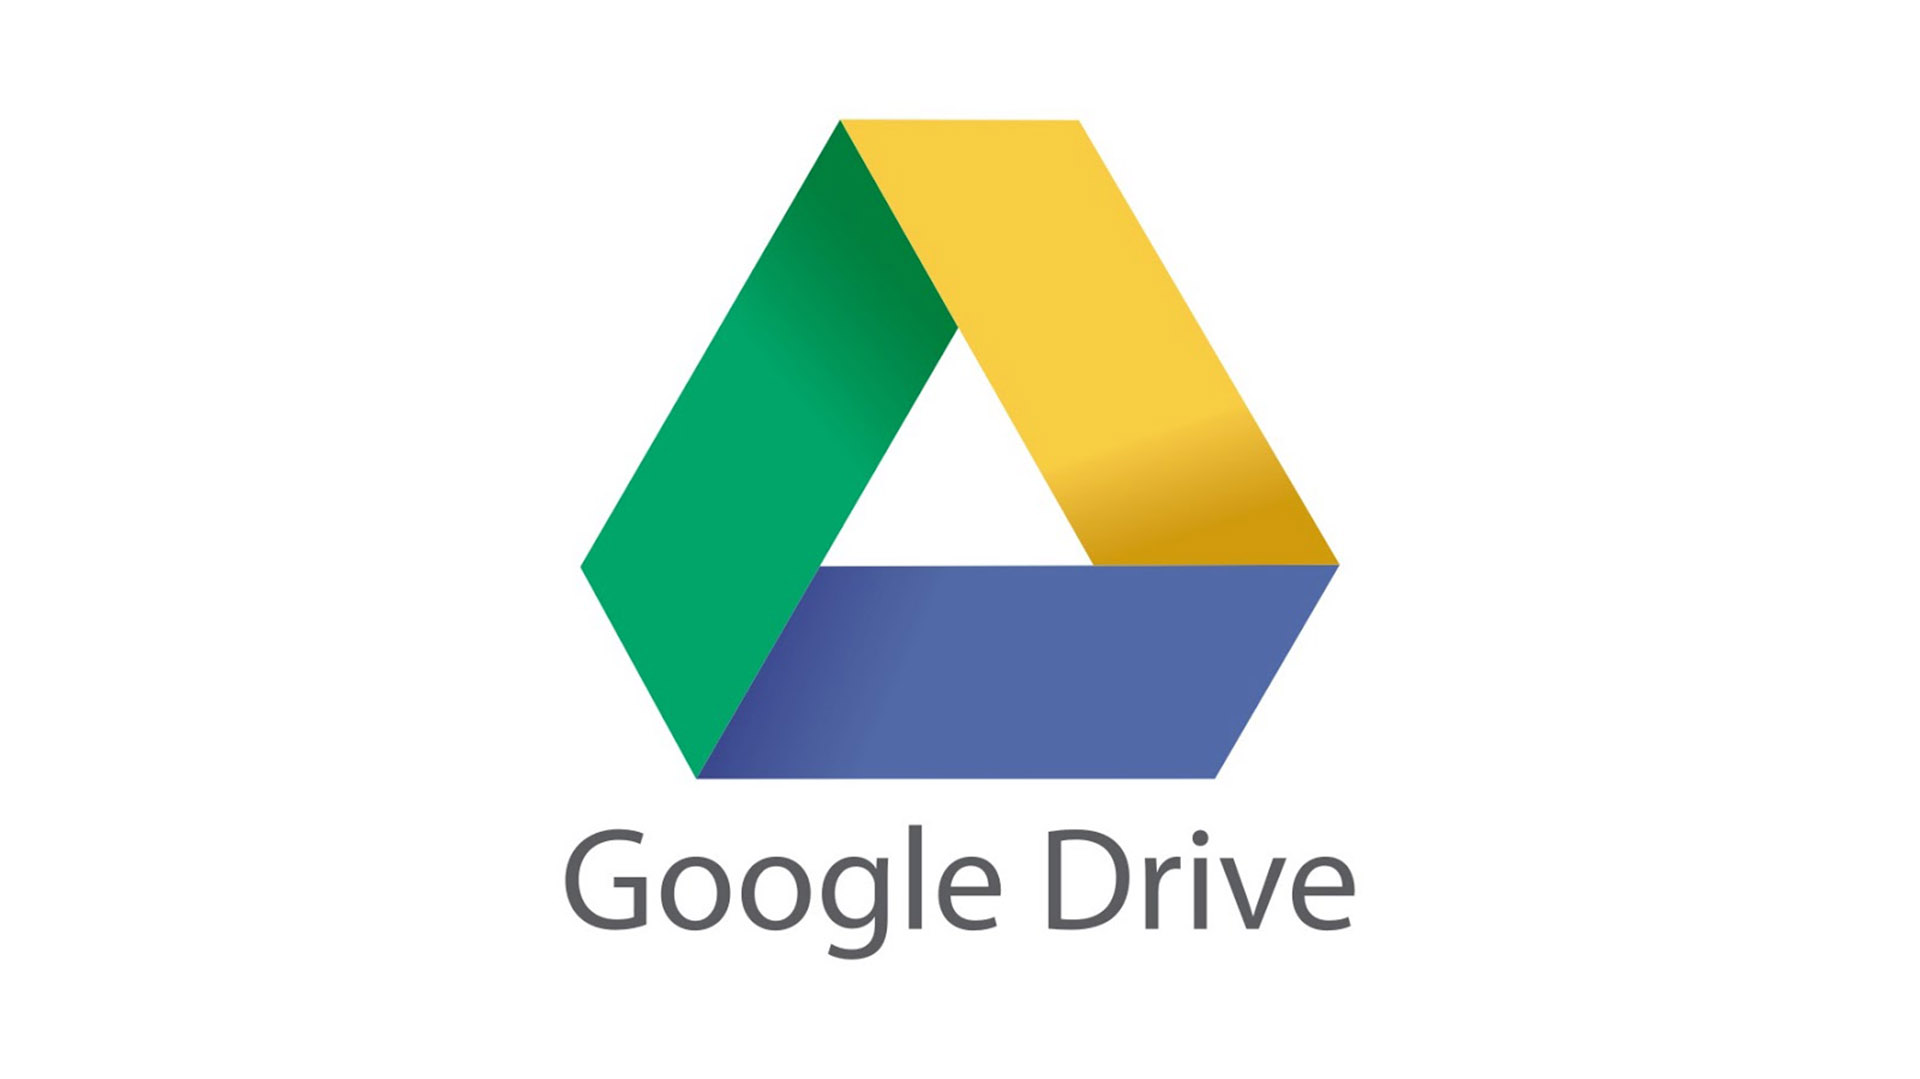 Google Drive comenzará a borrar tus documentos archivados